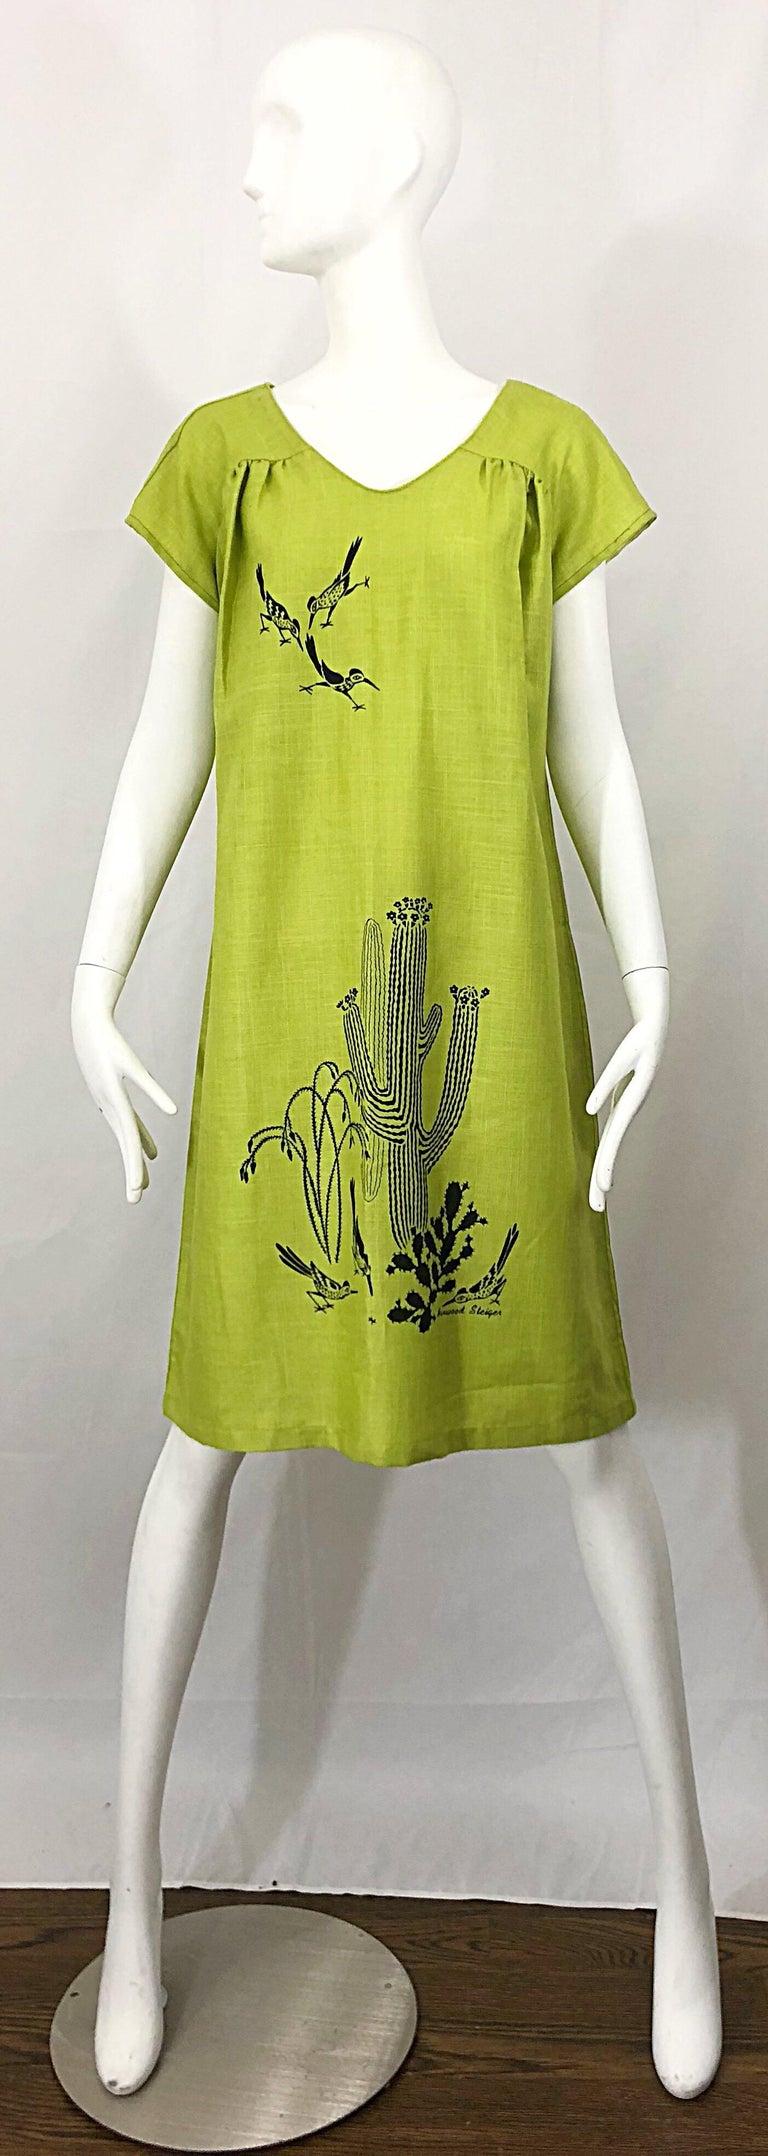 Rare 1970s Harwood Steiger Screen Printed Ant Eater Novelty Linen Tunic Dress For Sale 11